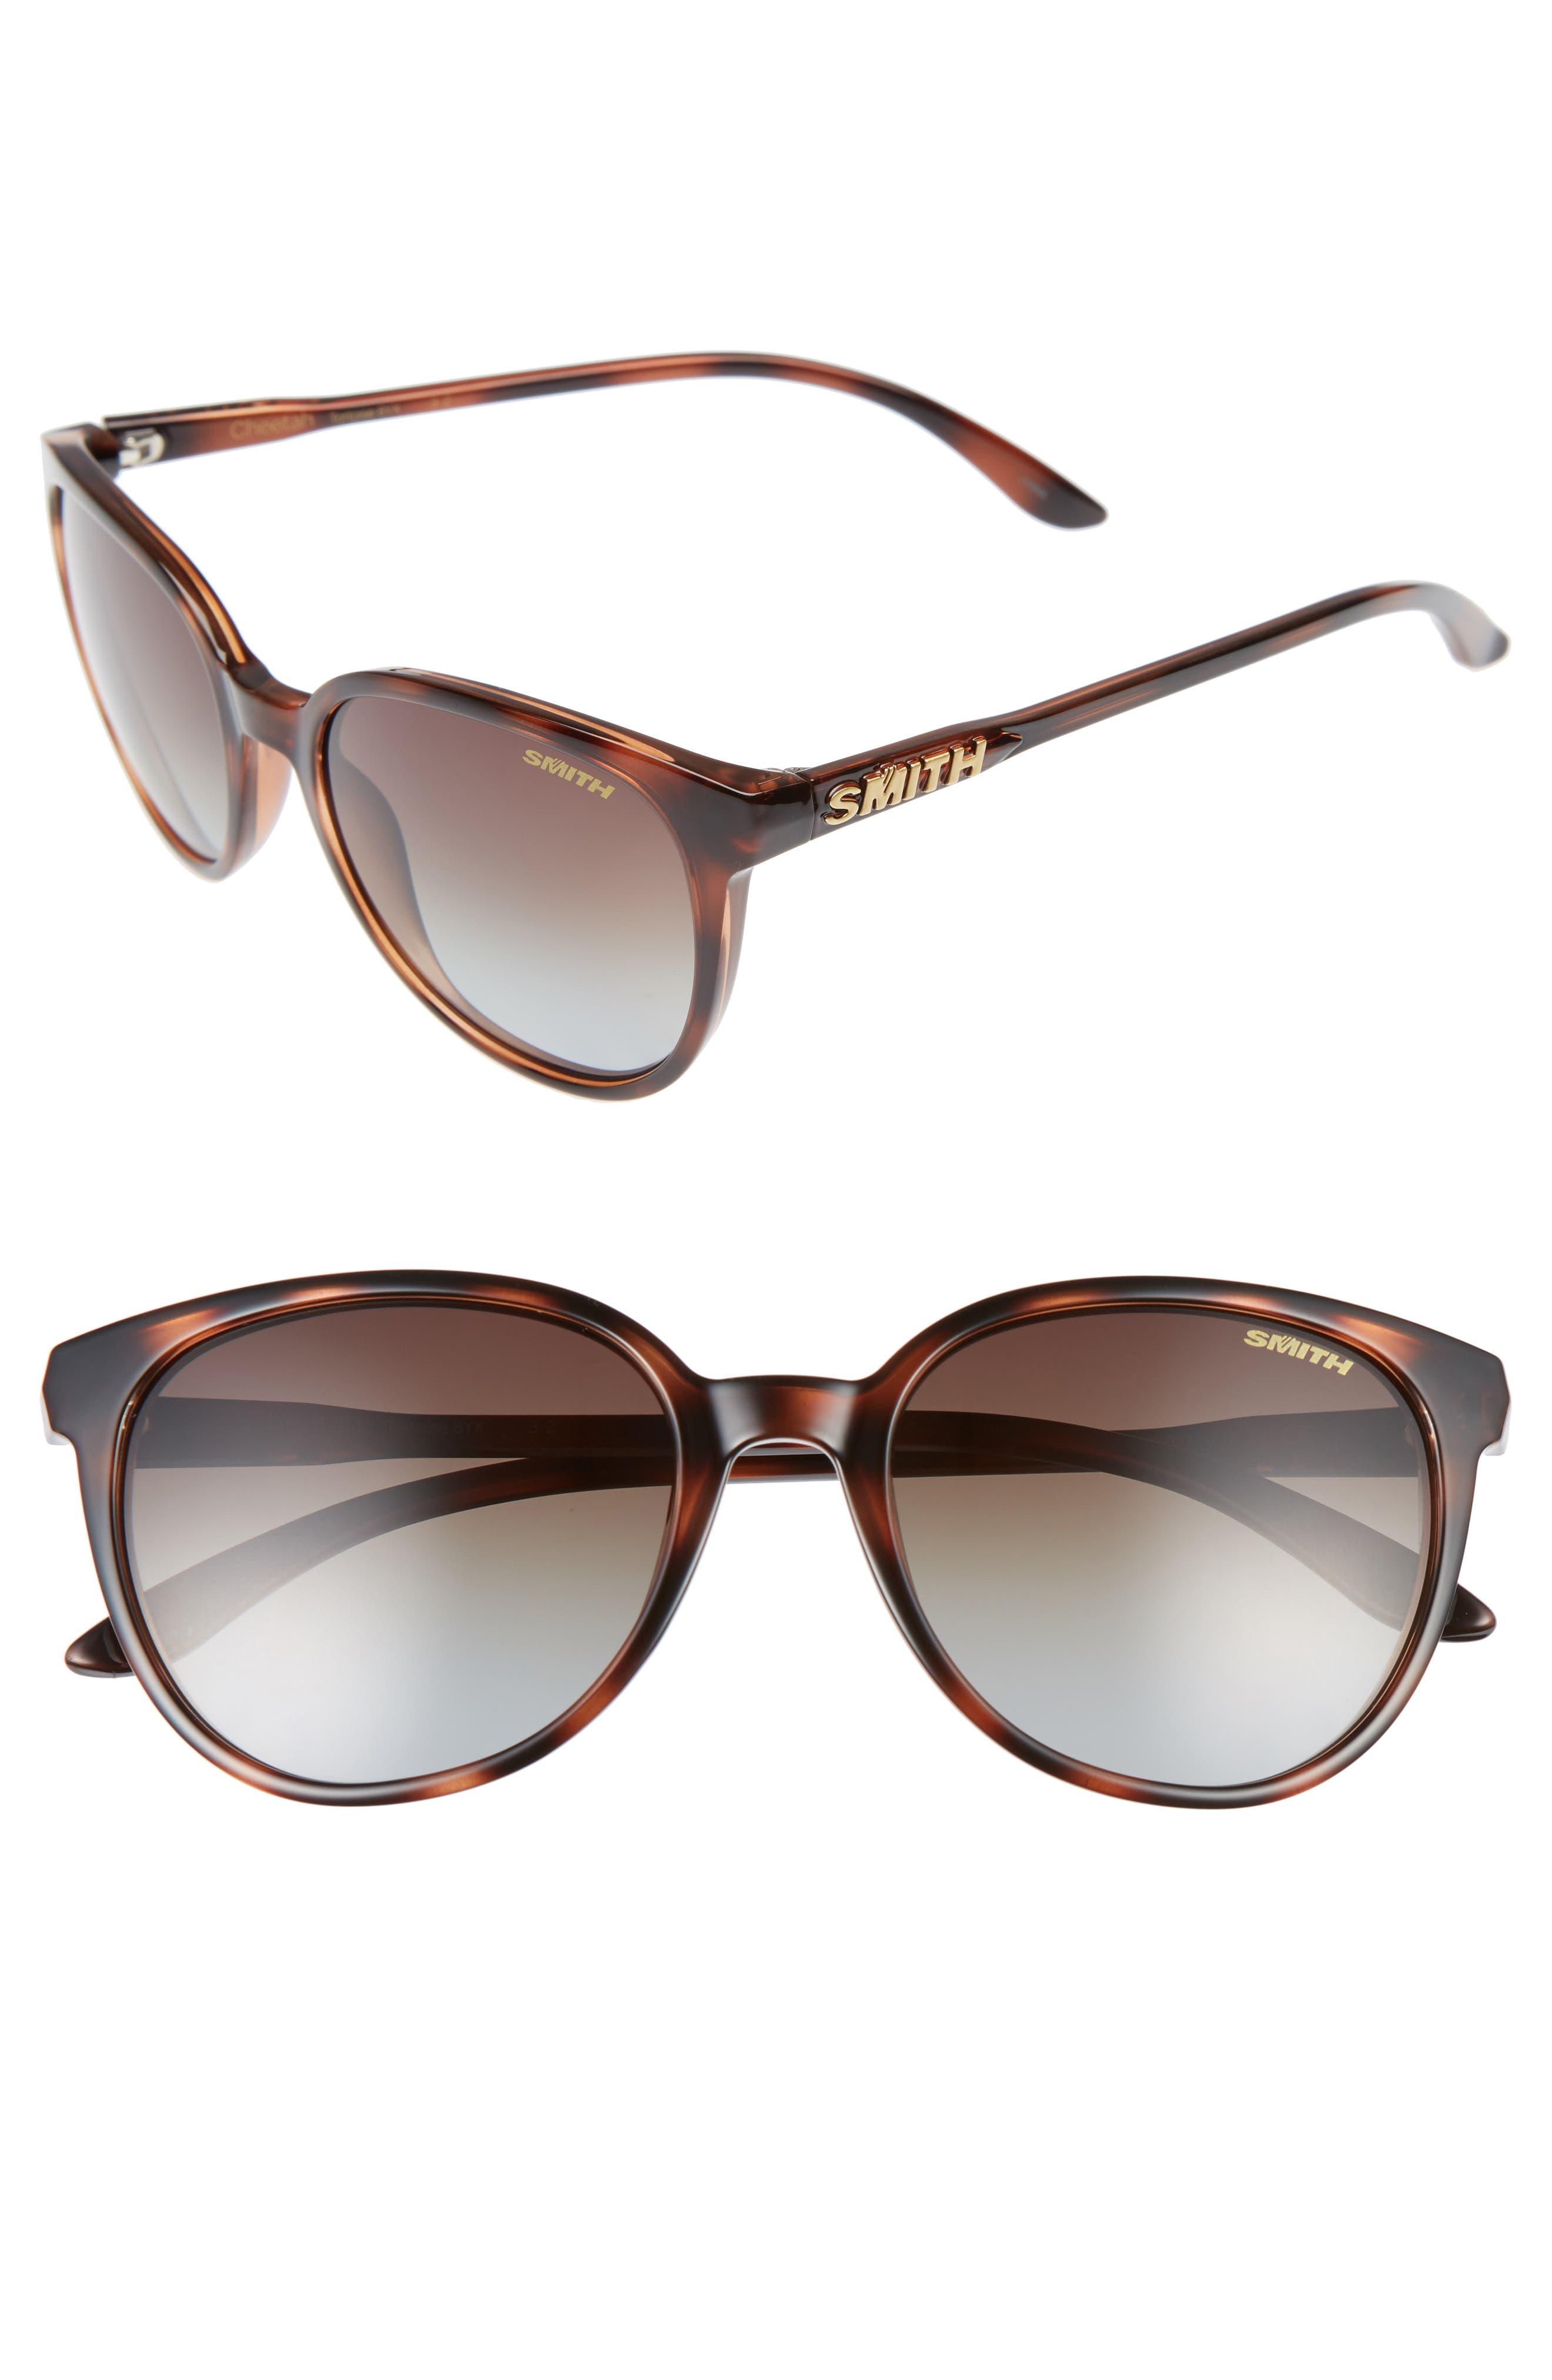 Cheetah 54mm Polarized Sunglasses,                         Main,                         color, TORTOISE